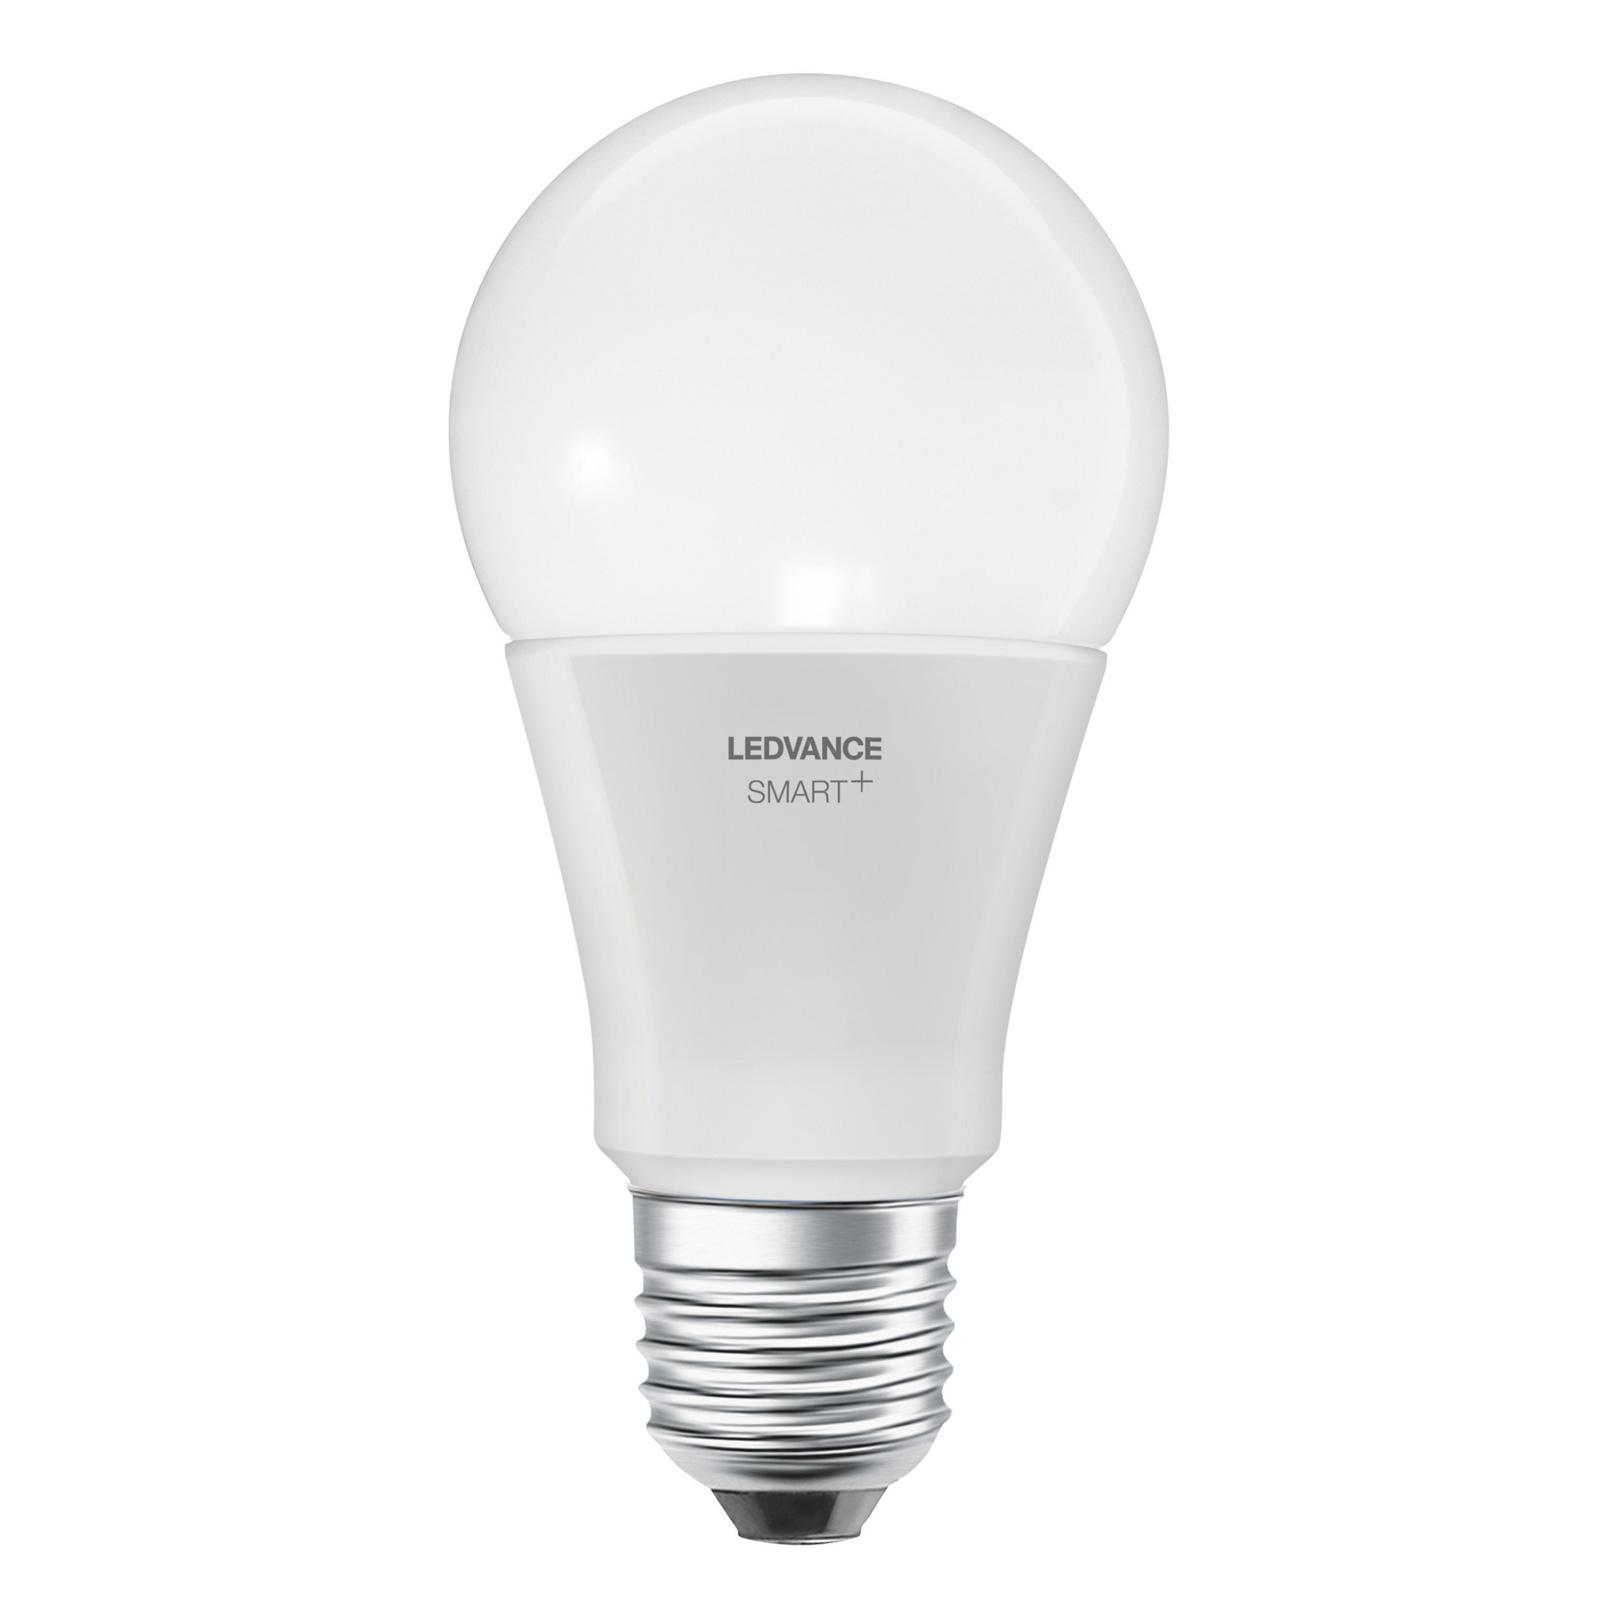 LEDVANCE SMART+ ZigBee E27 8,5W Classic 2700K